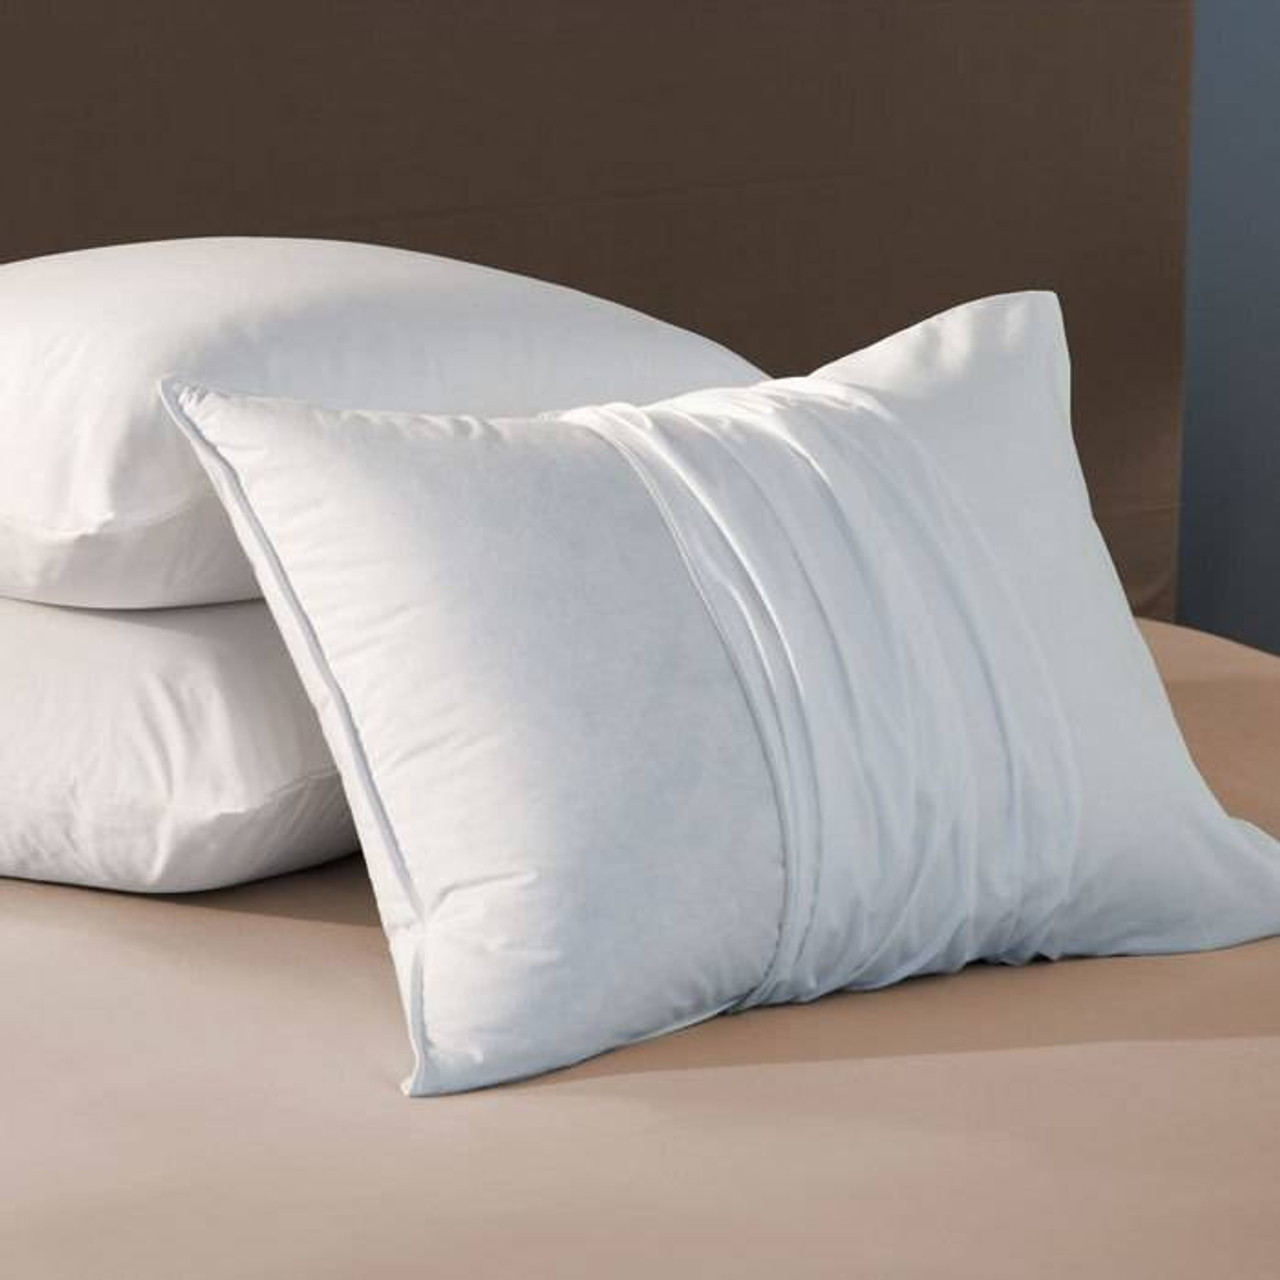 Restful Nights Restful Nights T-180 Envelope Pillow Protectors